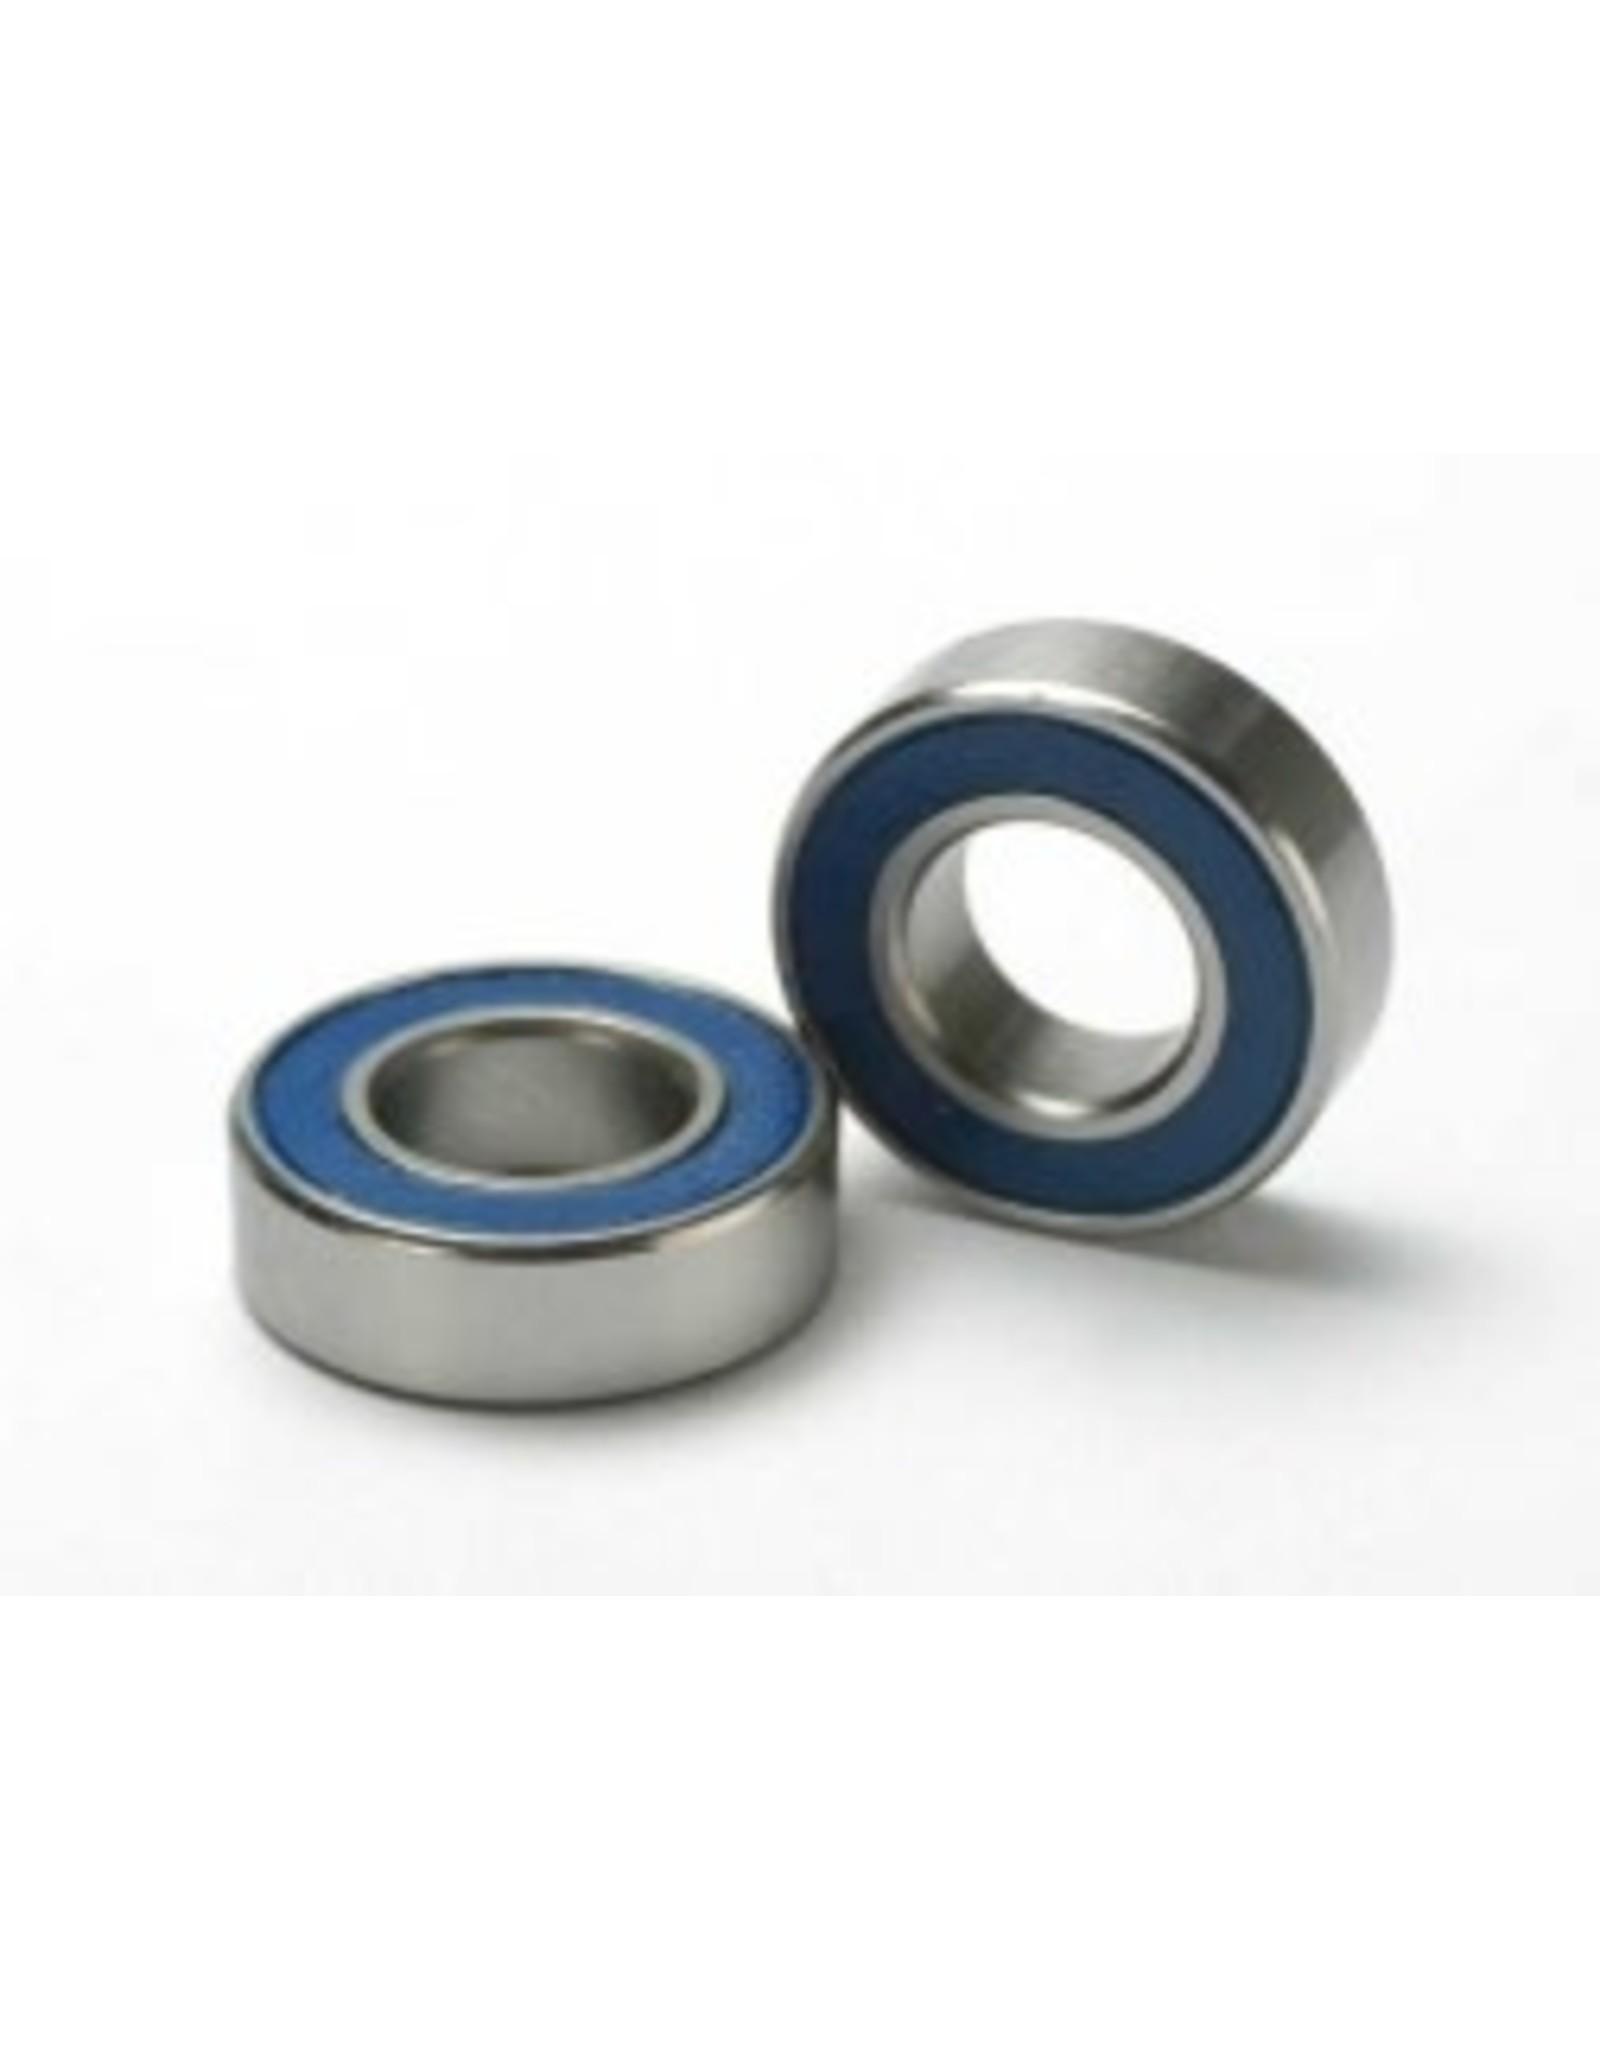 Traxxas Traxxas Ball bearings blue rubber sealed (8x16x5mm) 2 TRA5118